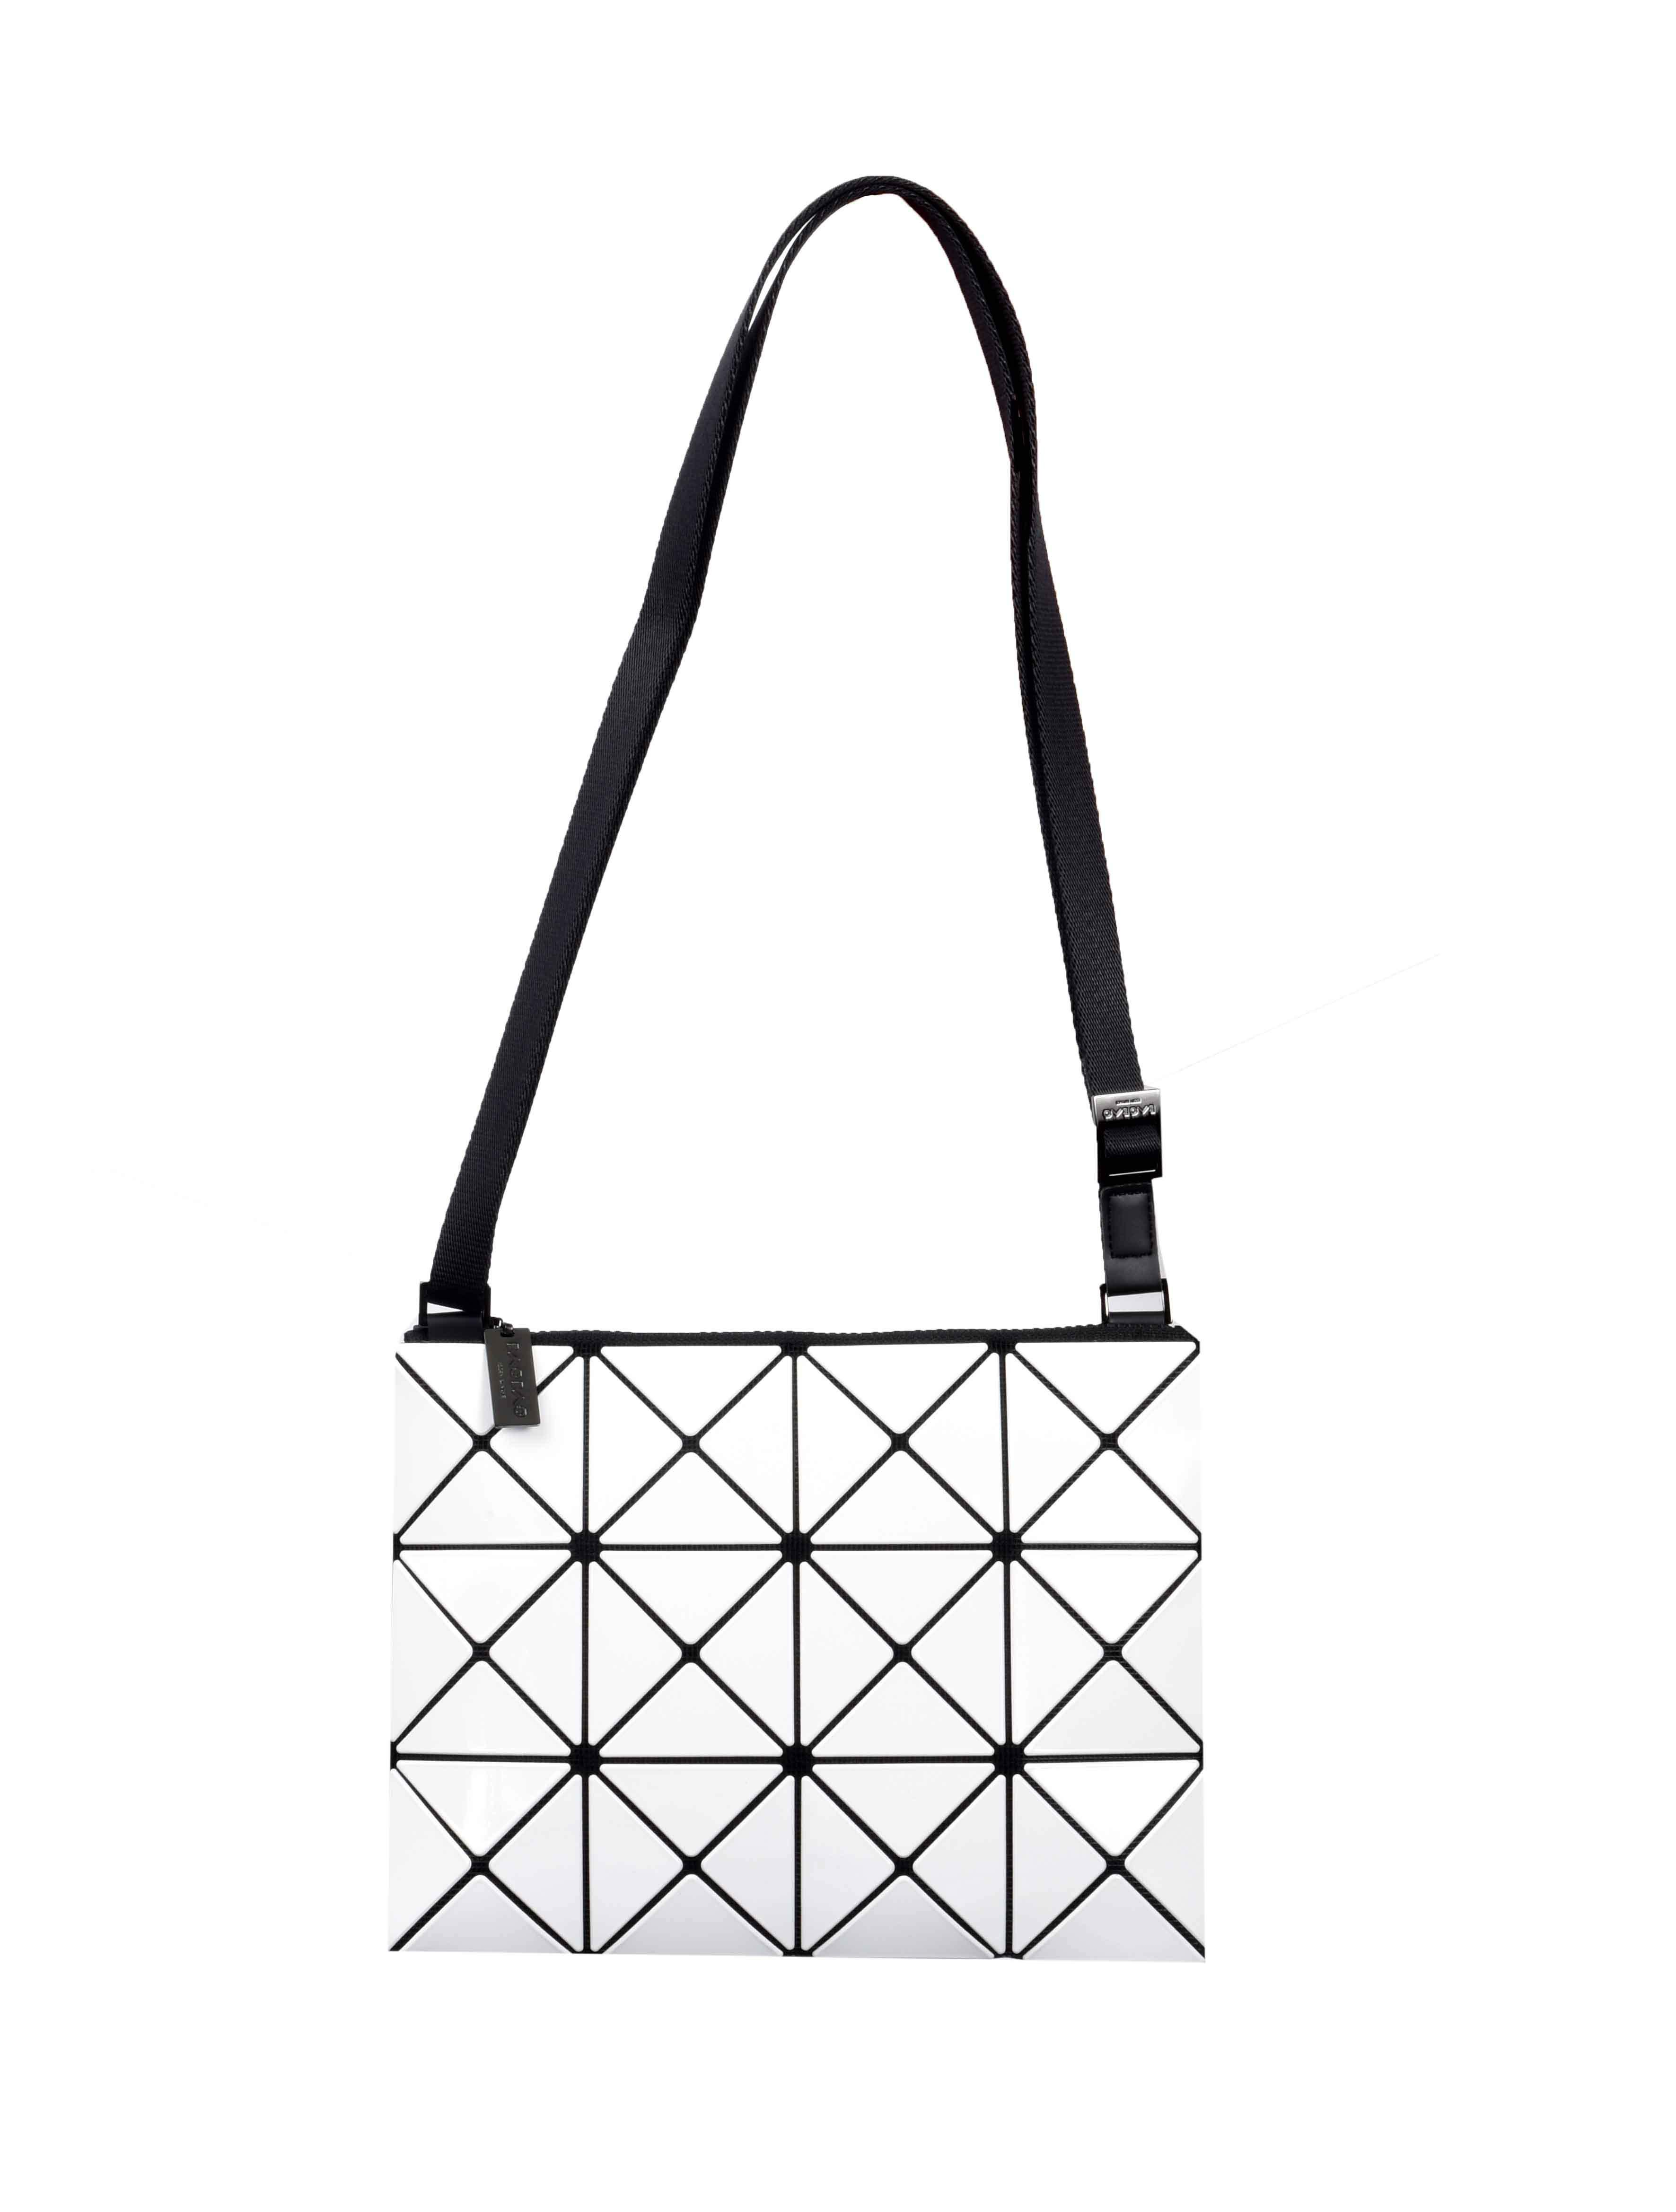 cb38252ca9d0 Bao Bao Issey Miyake Prism Shoulder Bag in White - Lyst